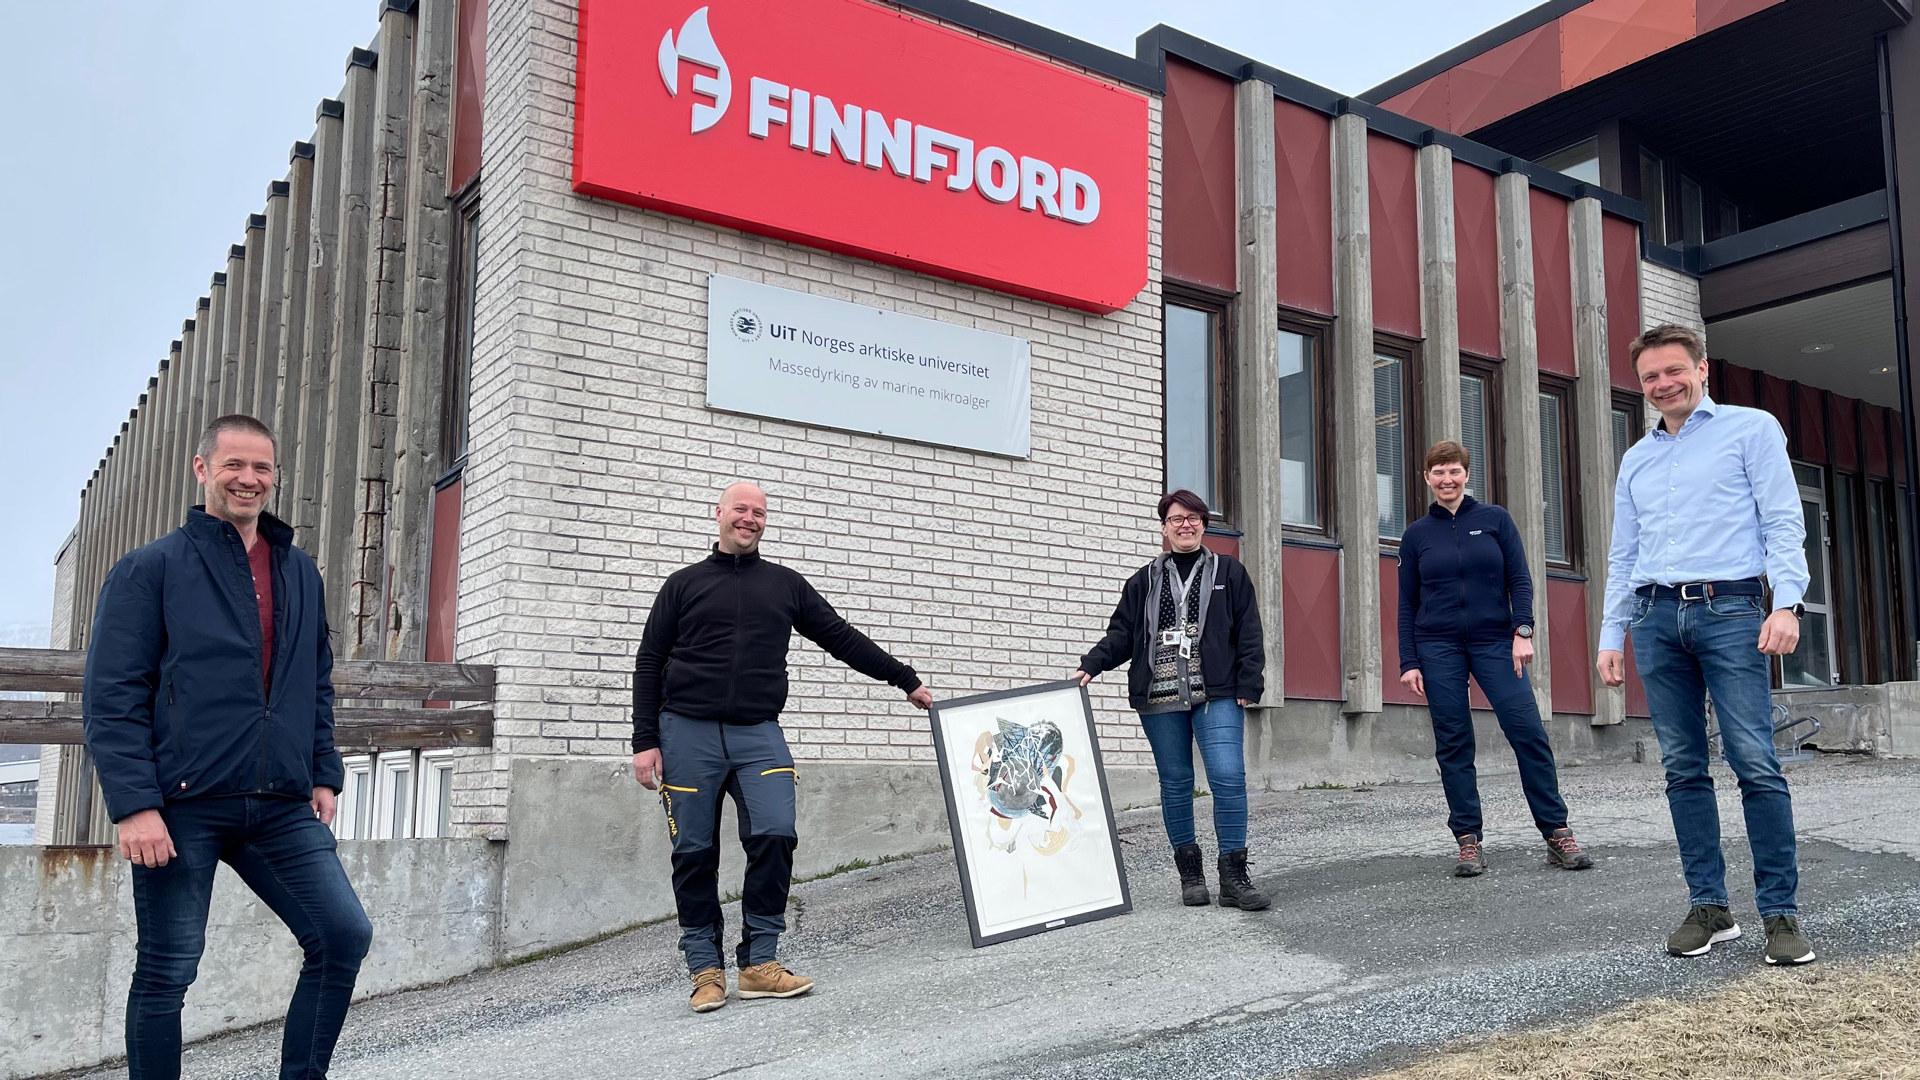 Finnfjord HMS pris